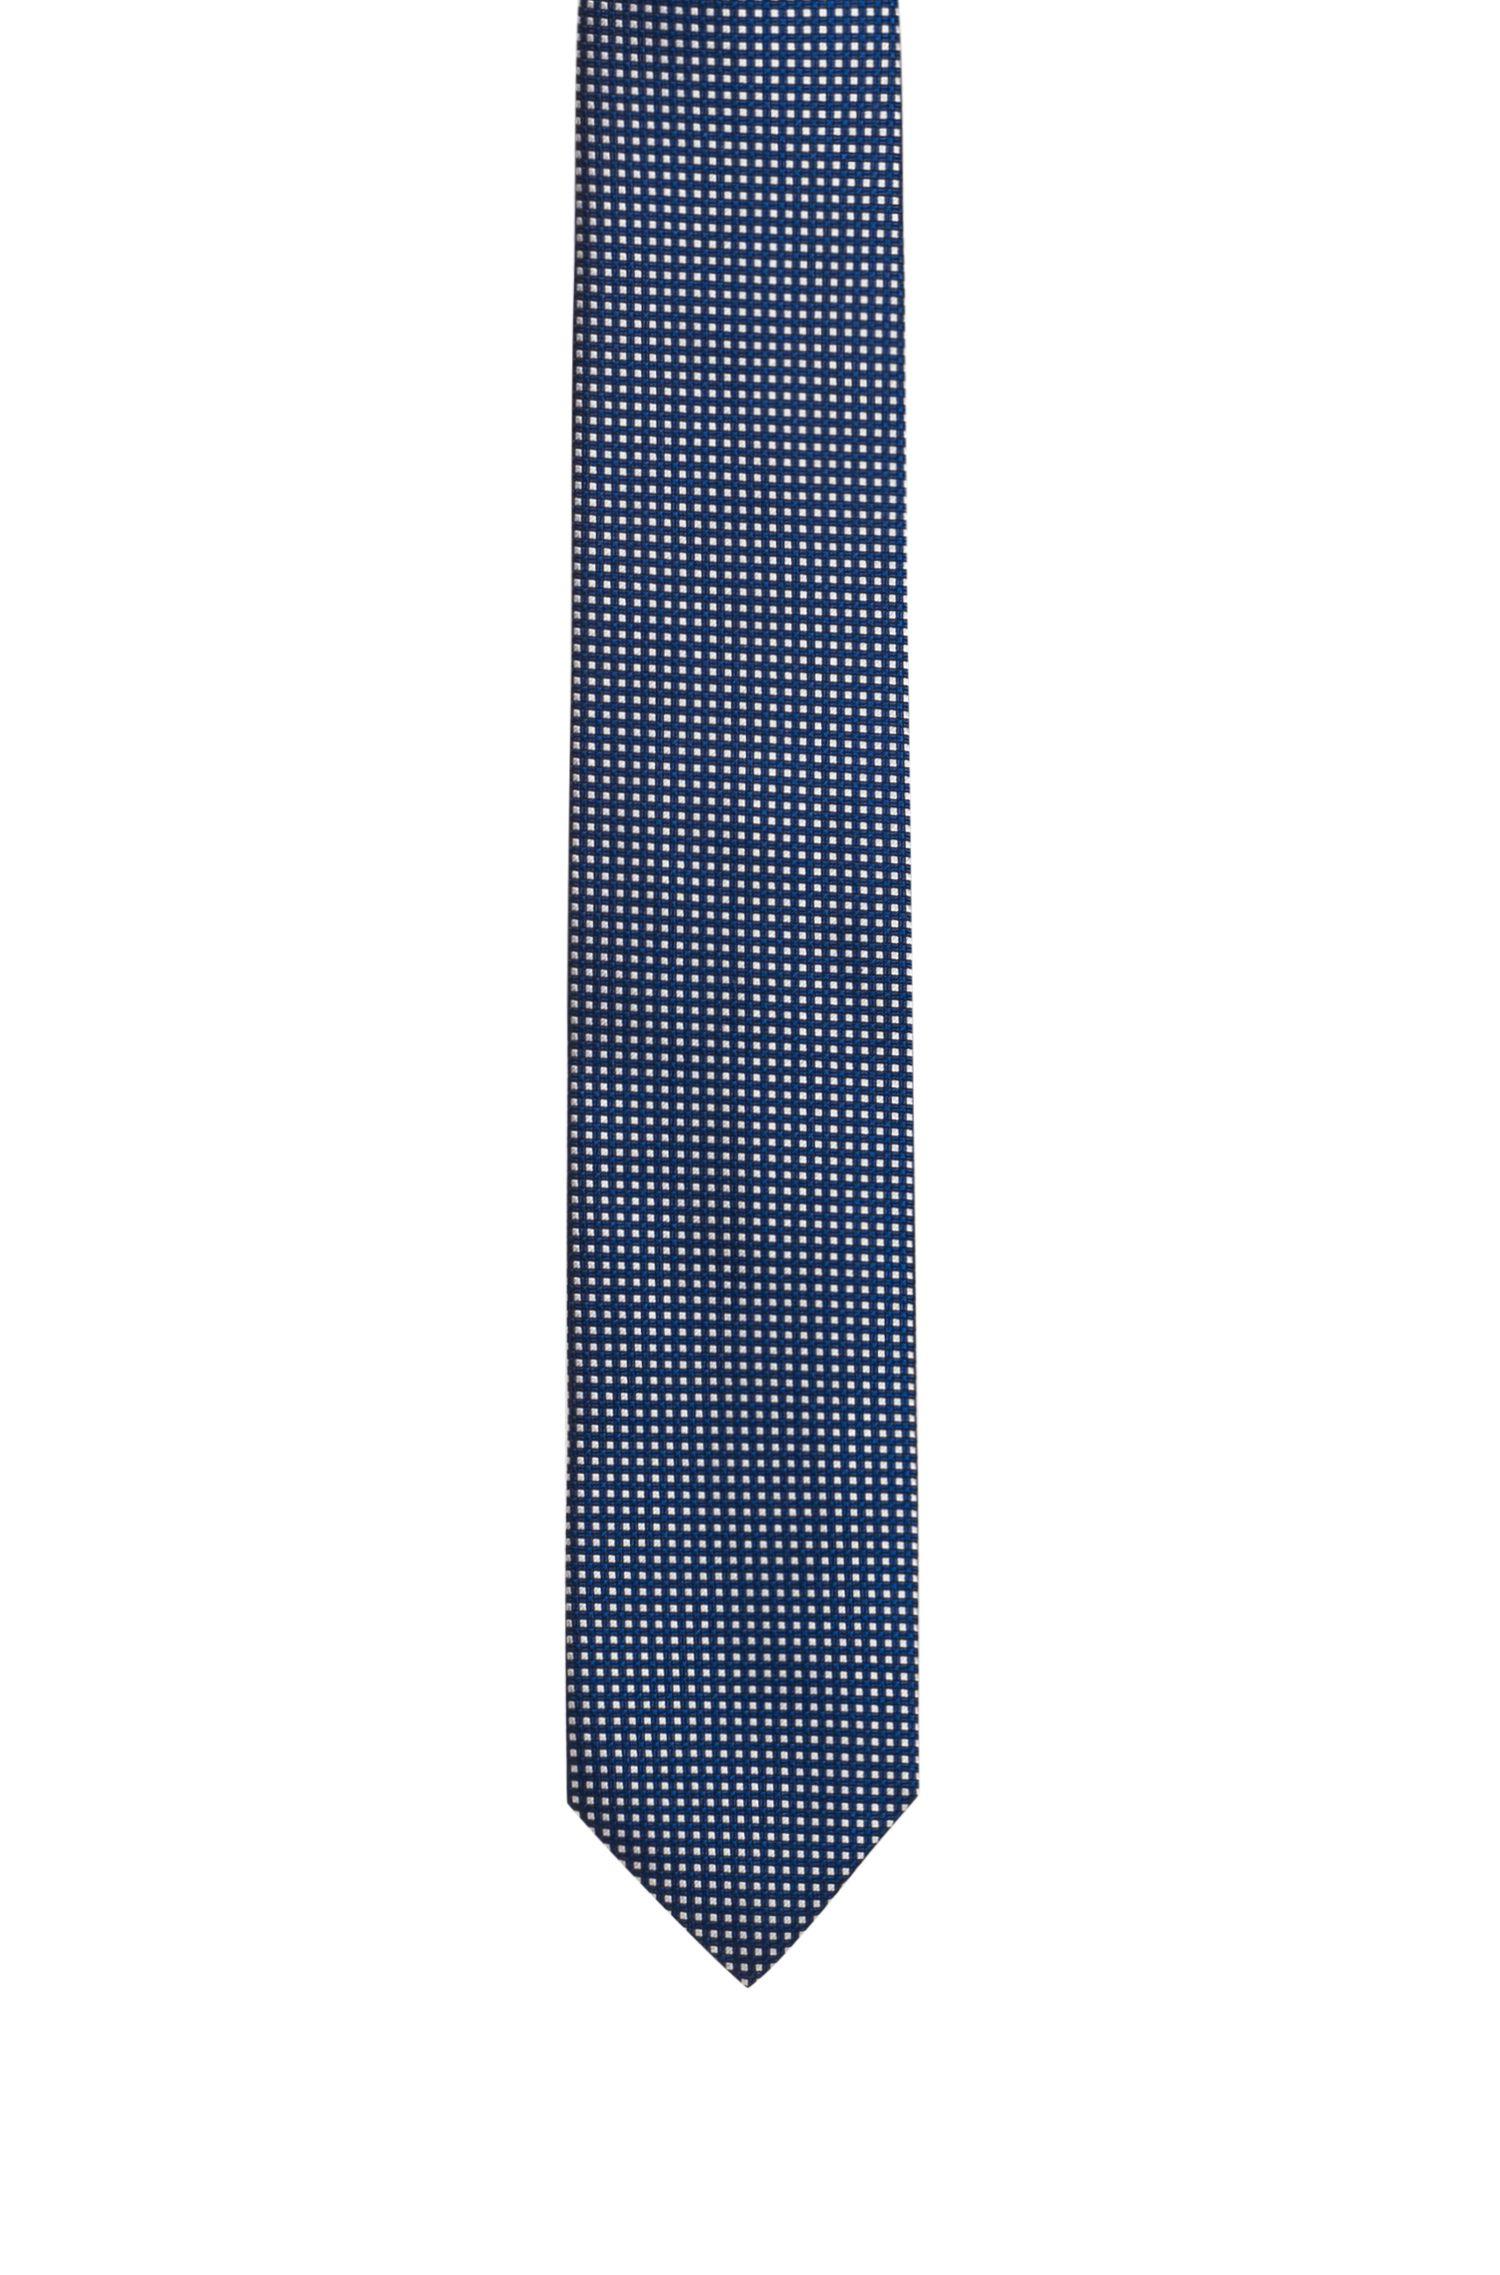 Corbata de jacquard en seda con microestampado